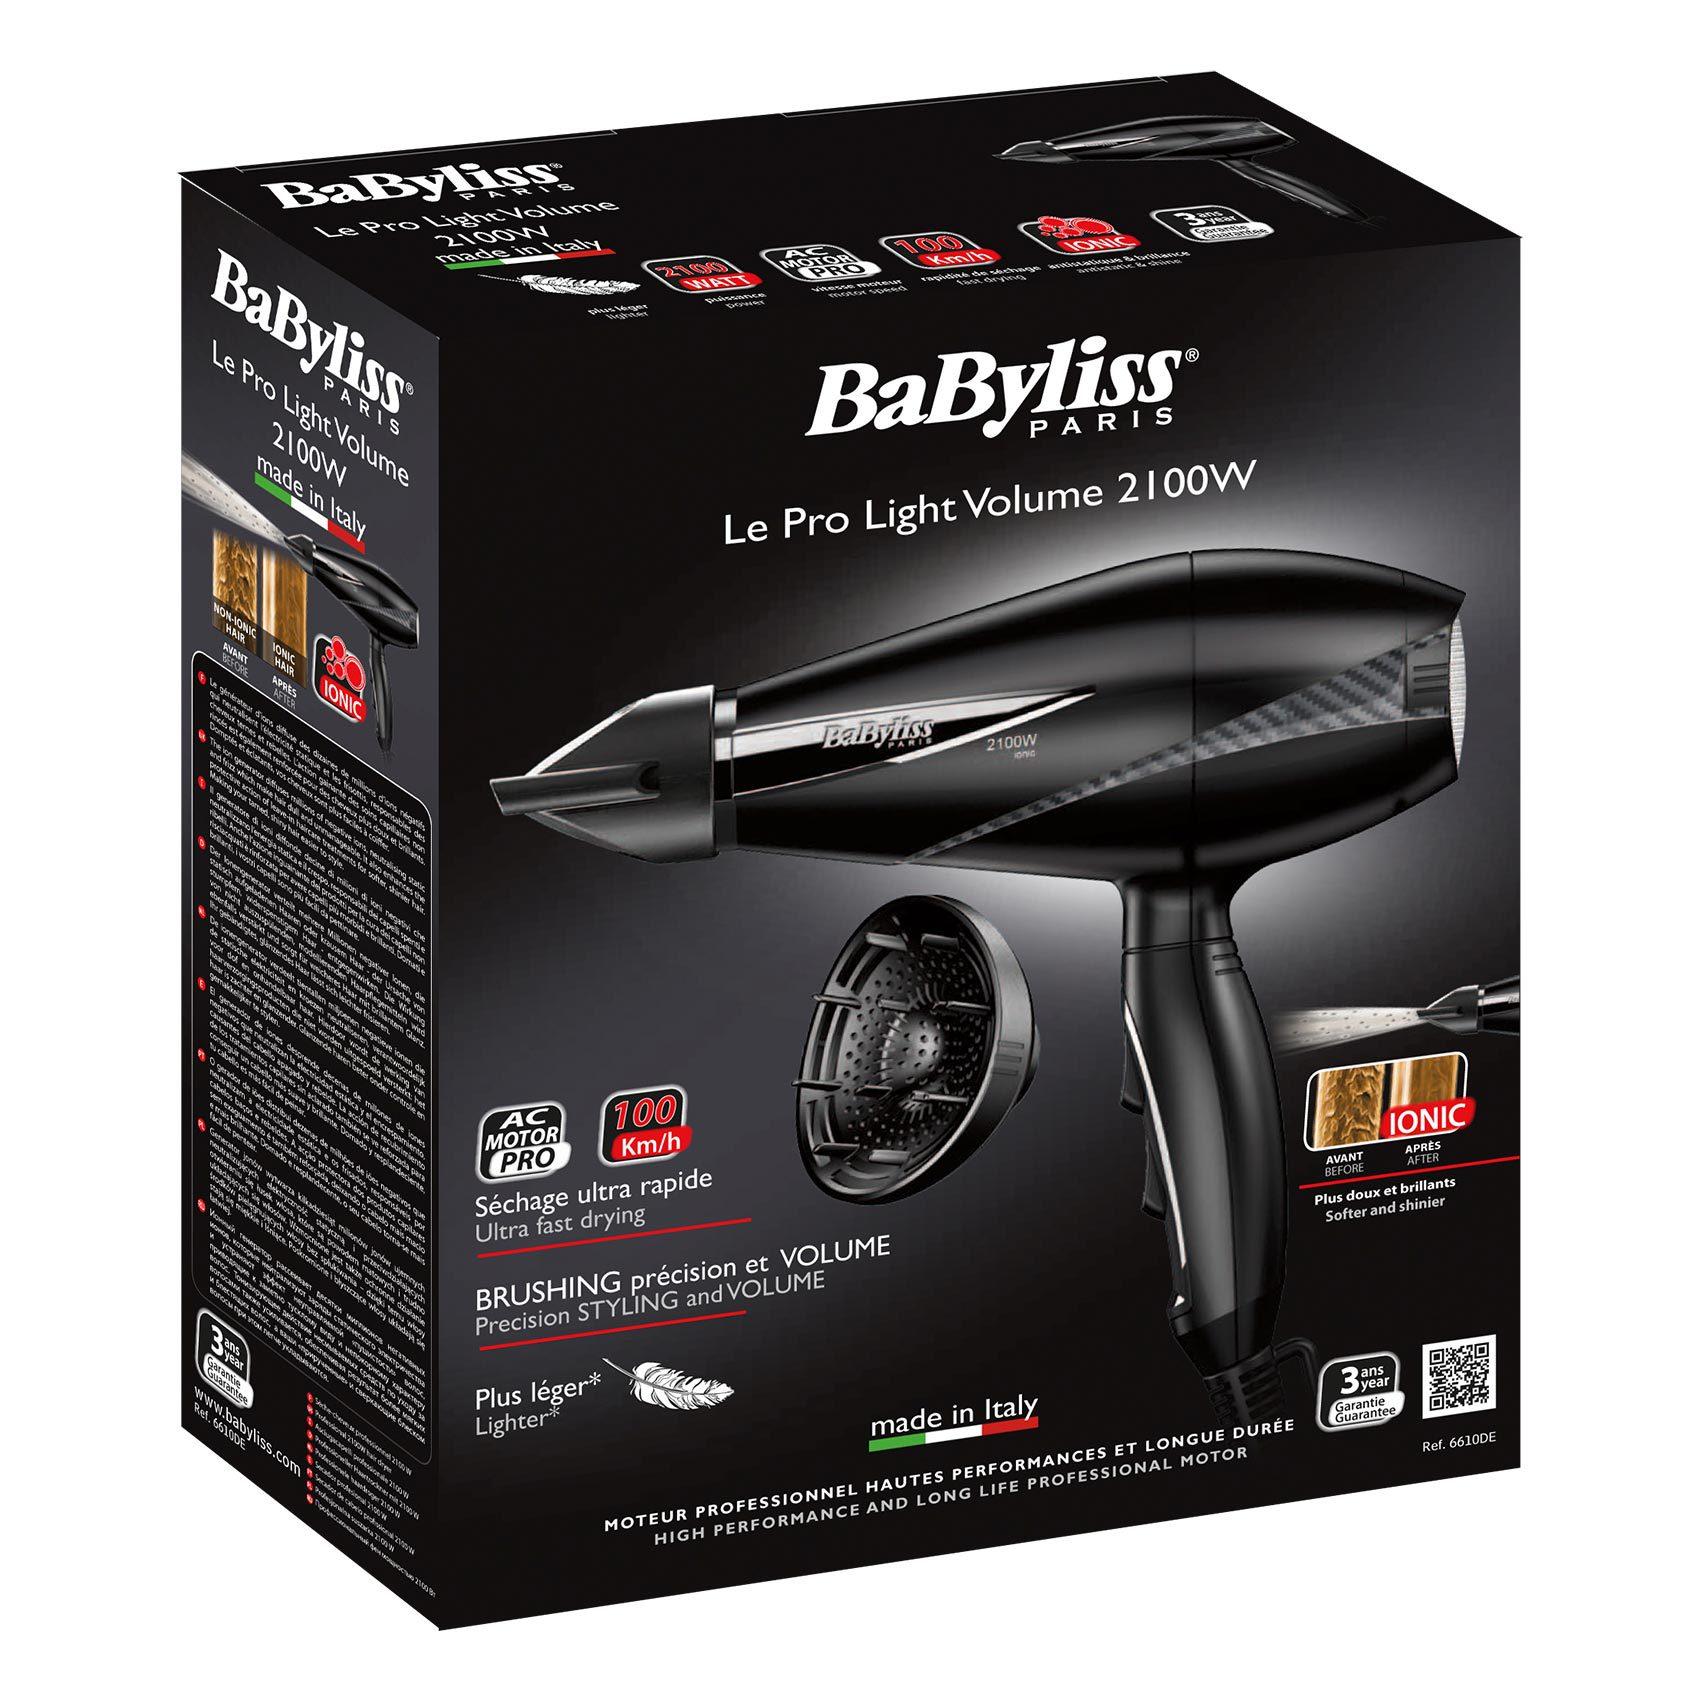 BABYLISS HAIR DRYER 6610 DSDE